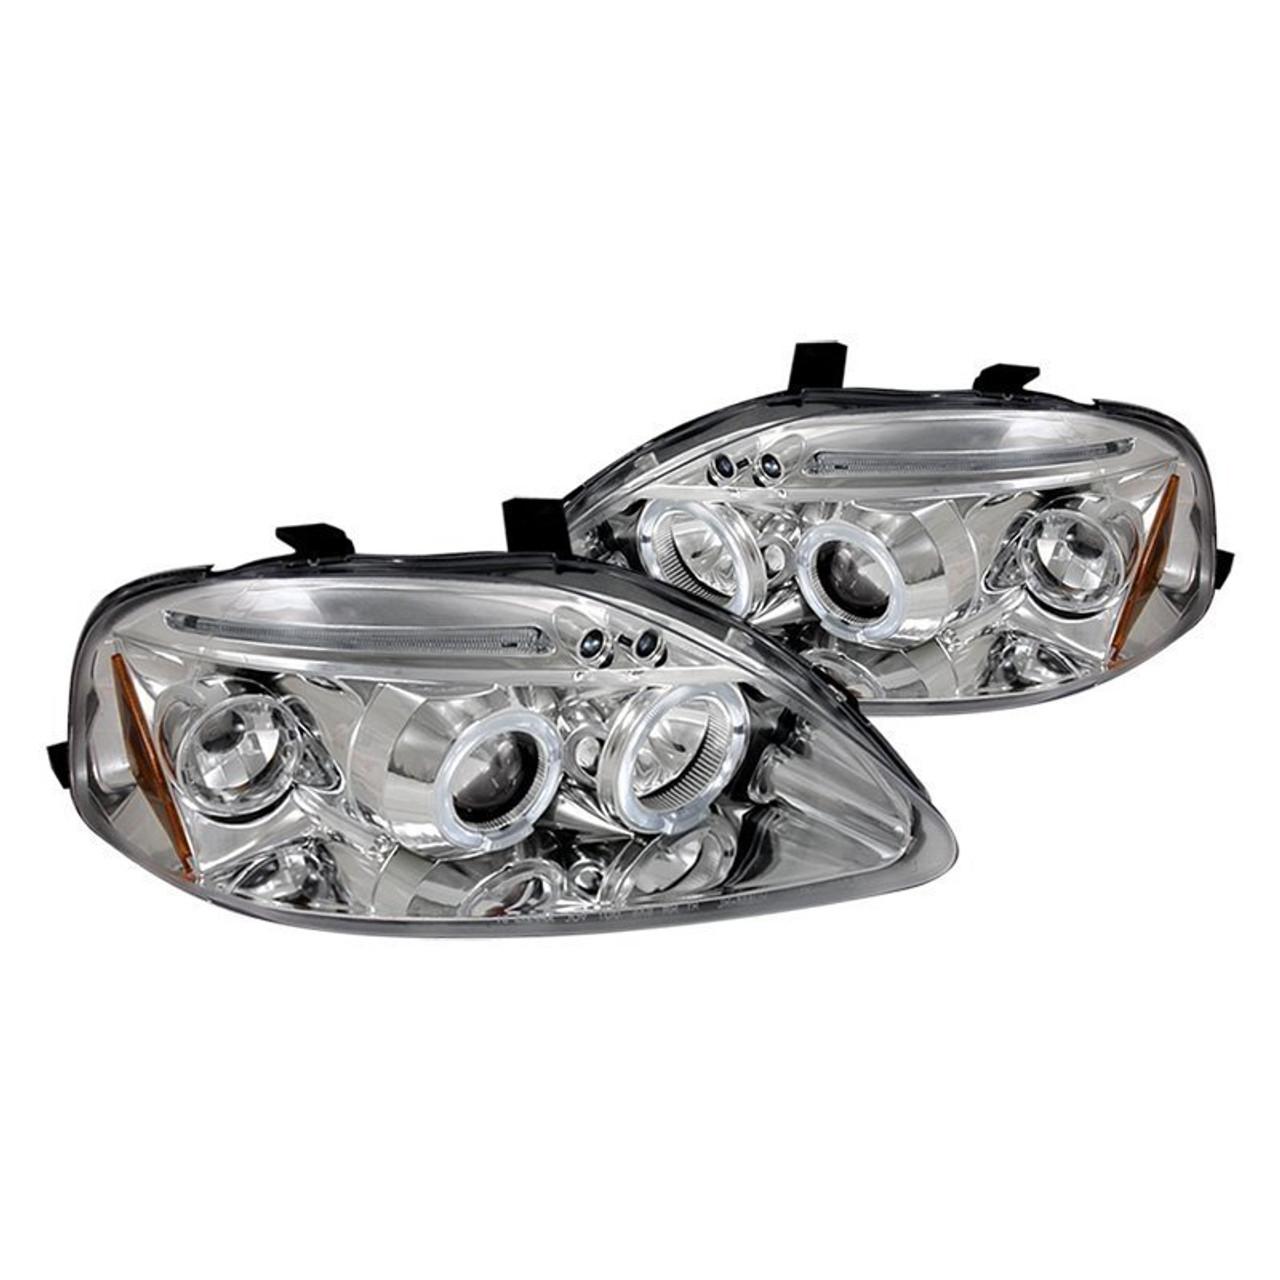 Free Shipping On Junyan 99 00 Civic Halo Projector HeadLights